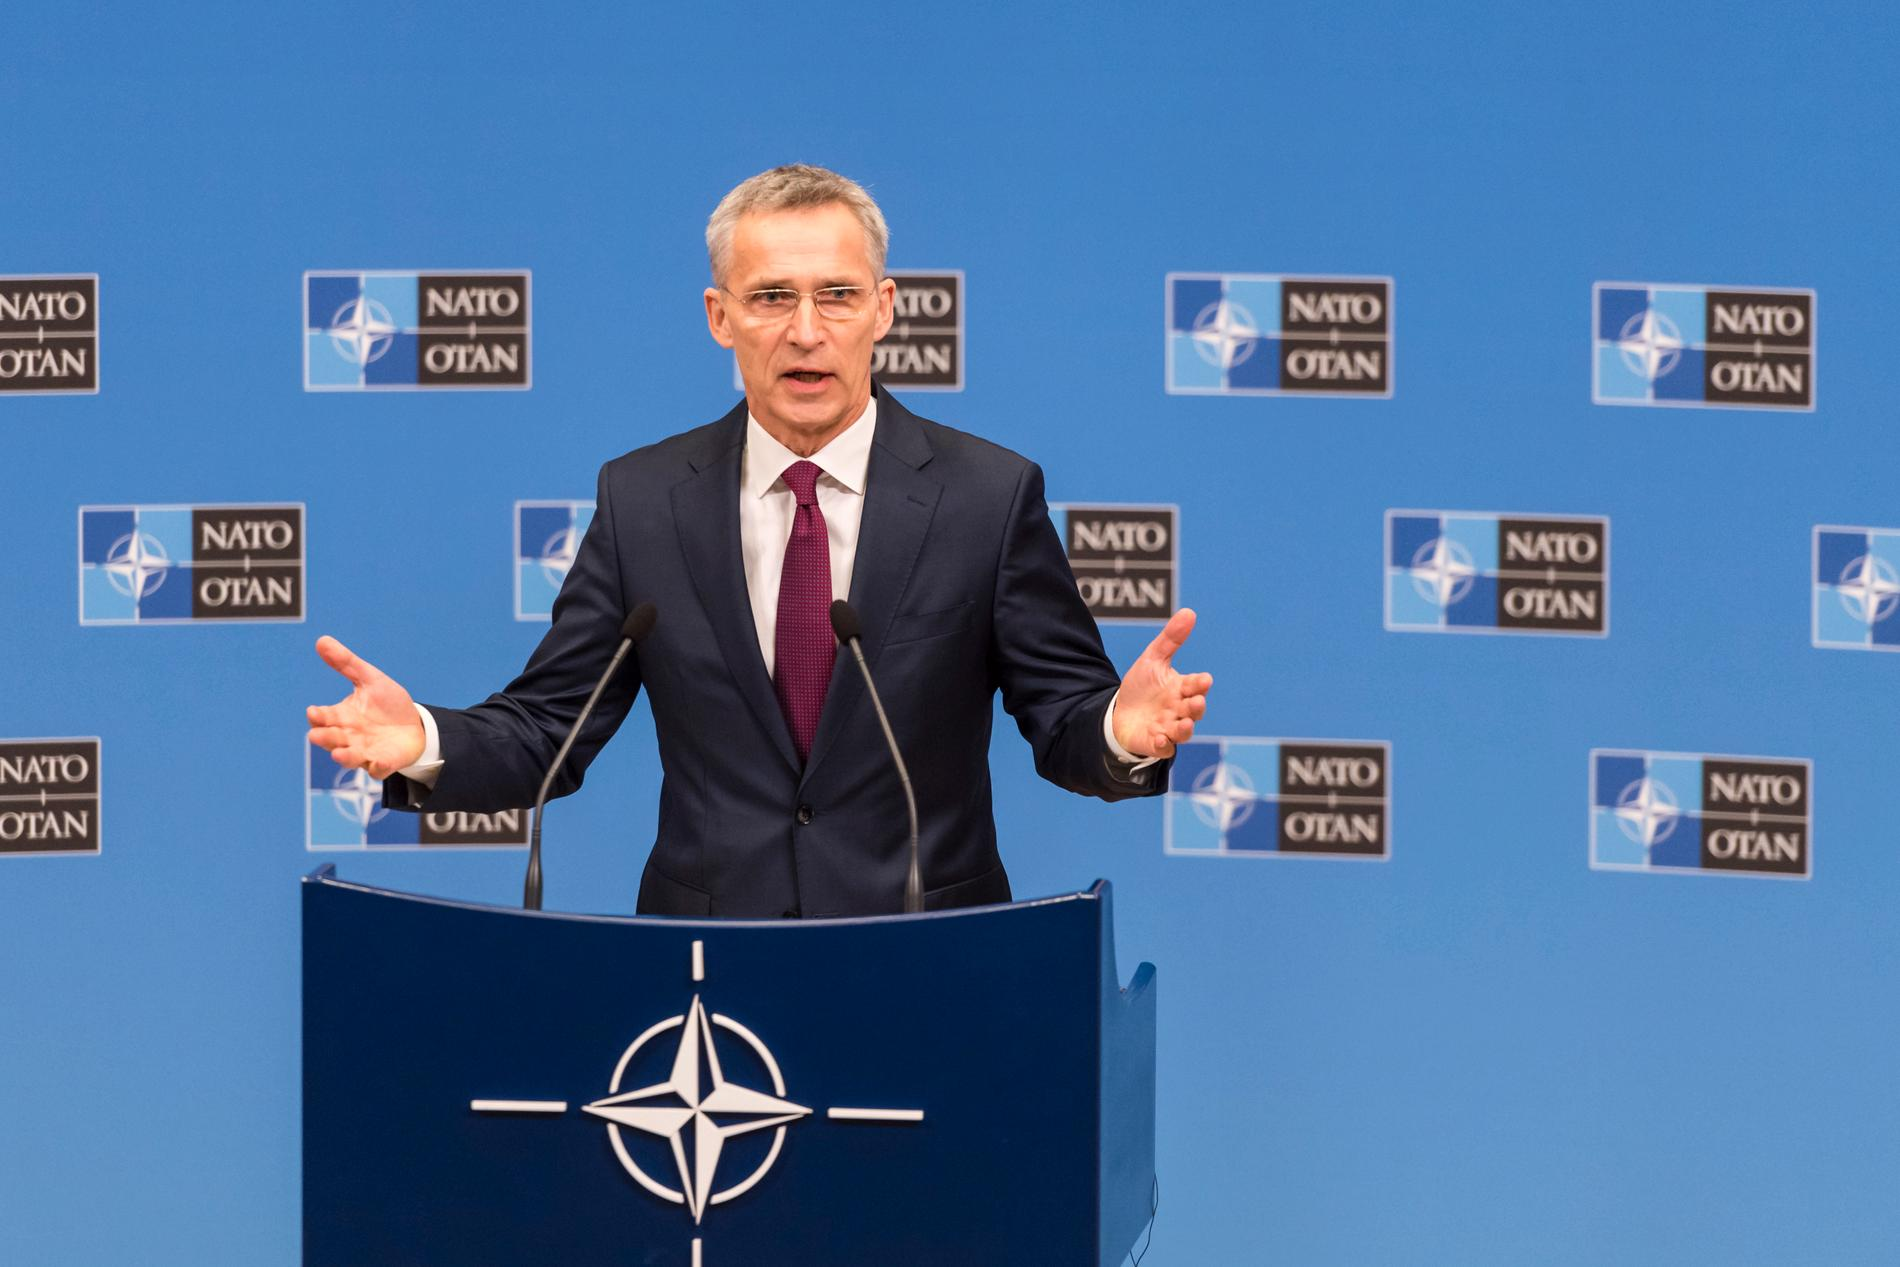 Nato-basen Jens Stoltenberg presenterar militäralliansens årsrapport.